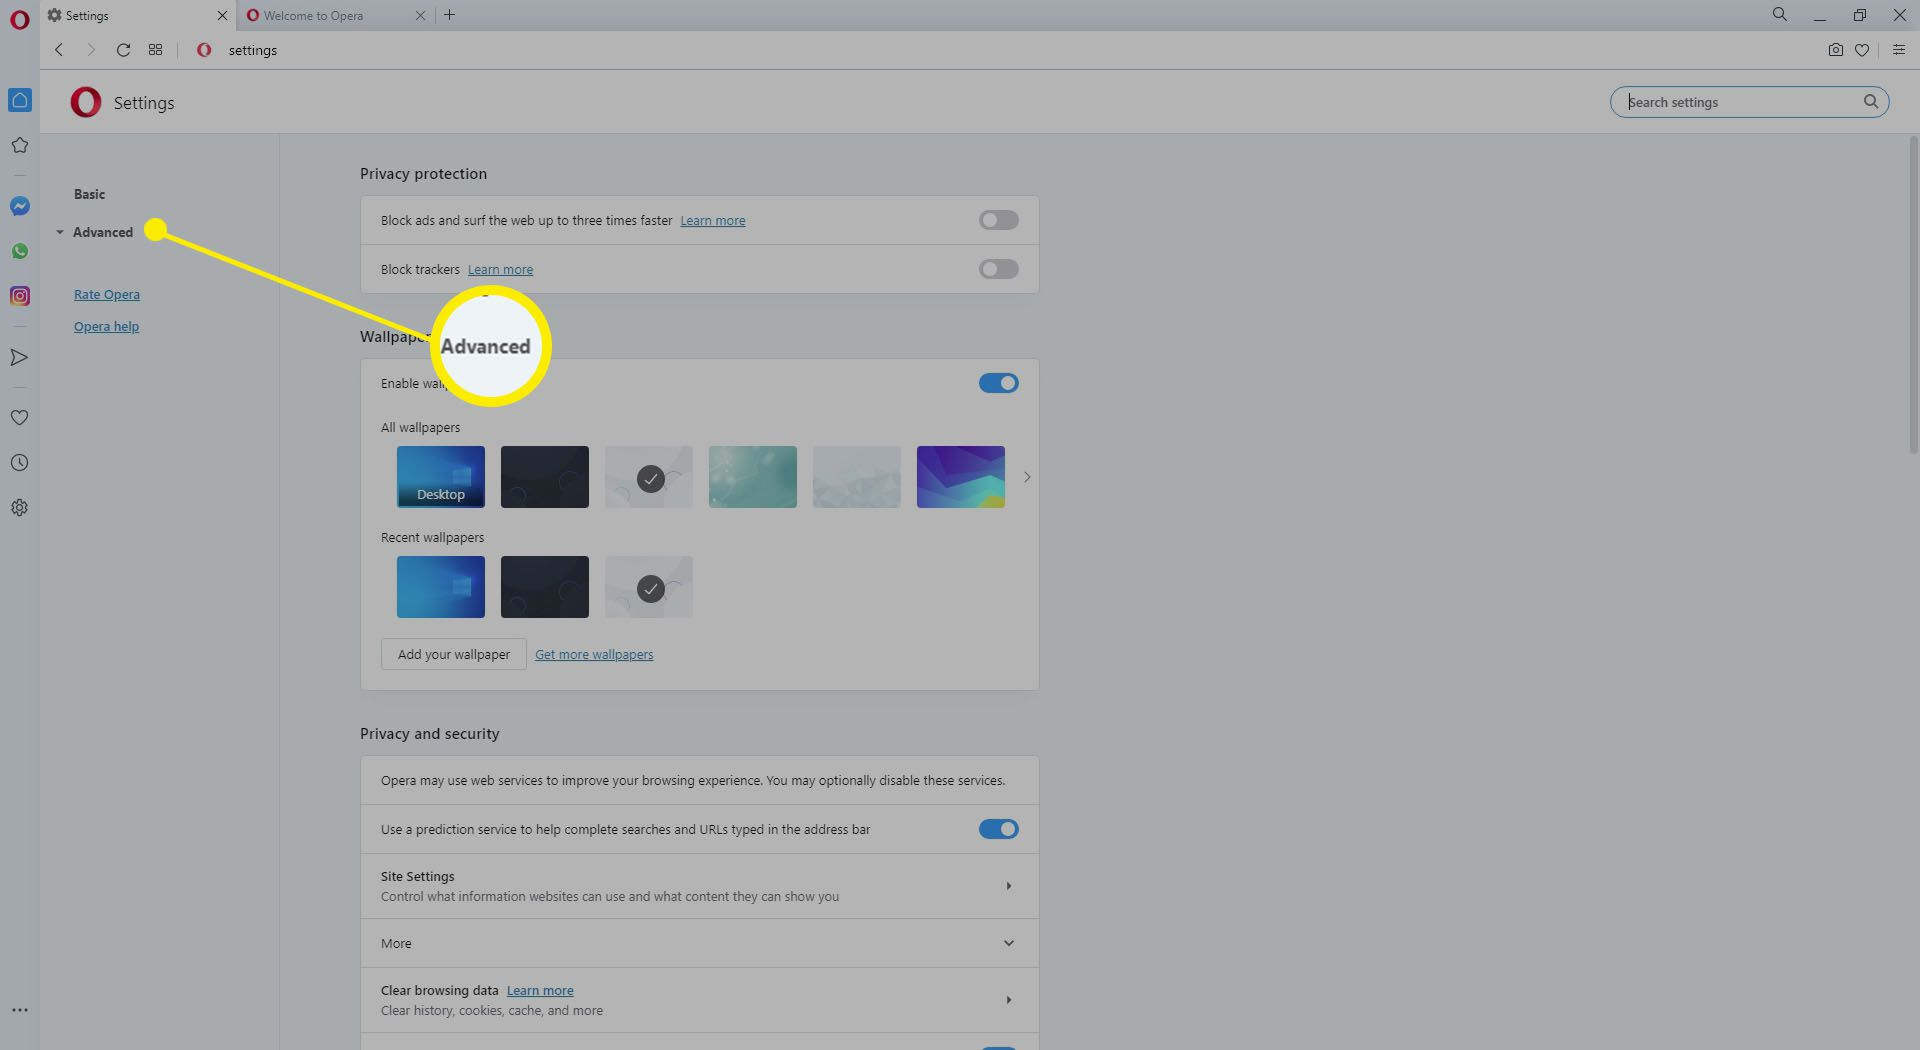 Screenshot of the Opera advanced settings link